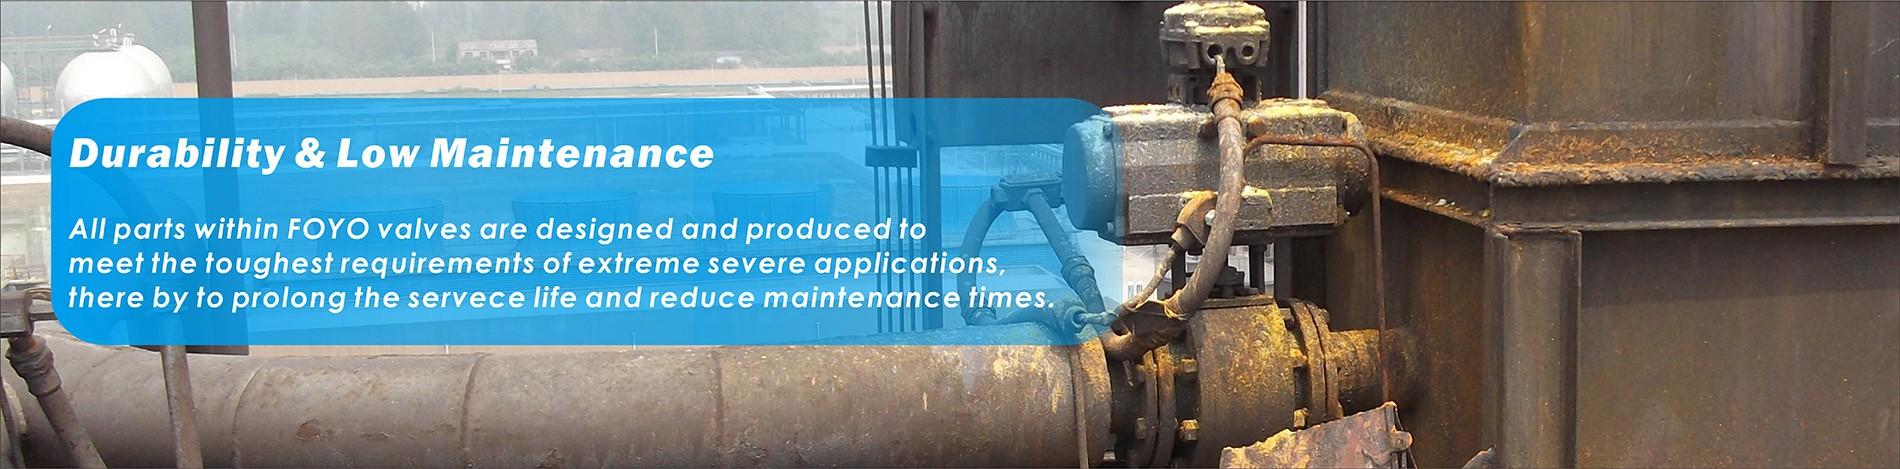 Durability and Low maintenance of Foyo Ceramic Valves